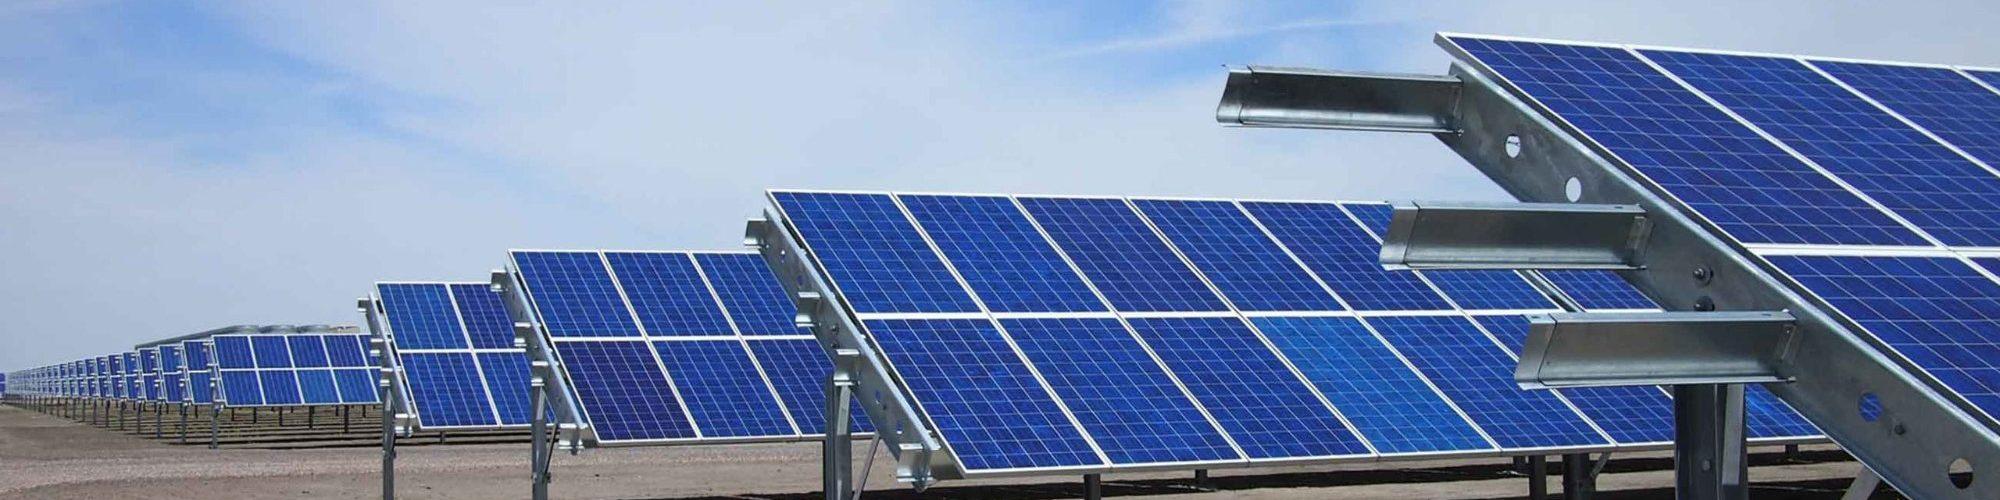 Sirmouri Solar Energy India Best Solar System Epc Company